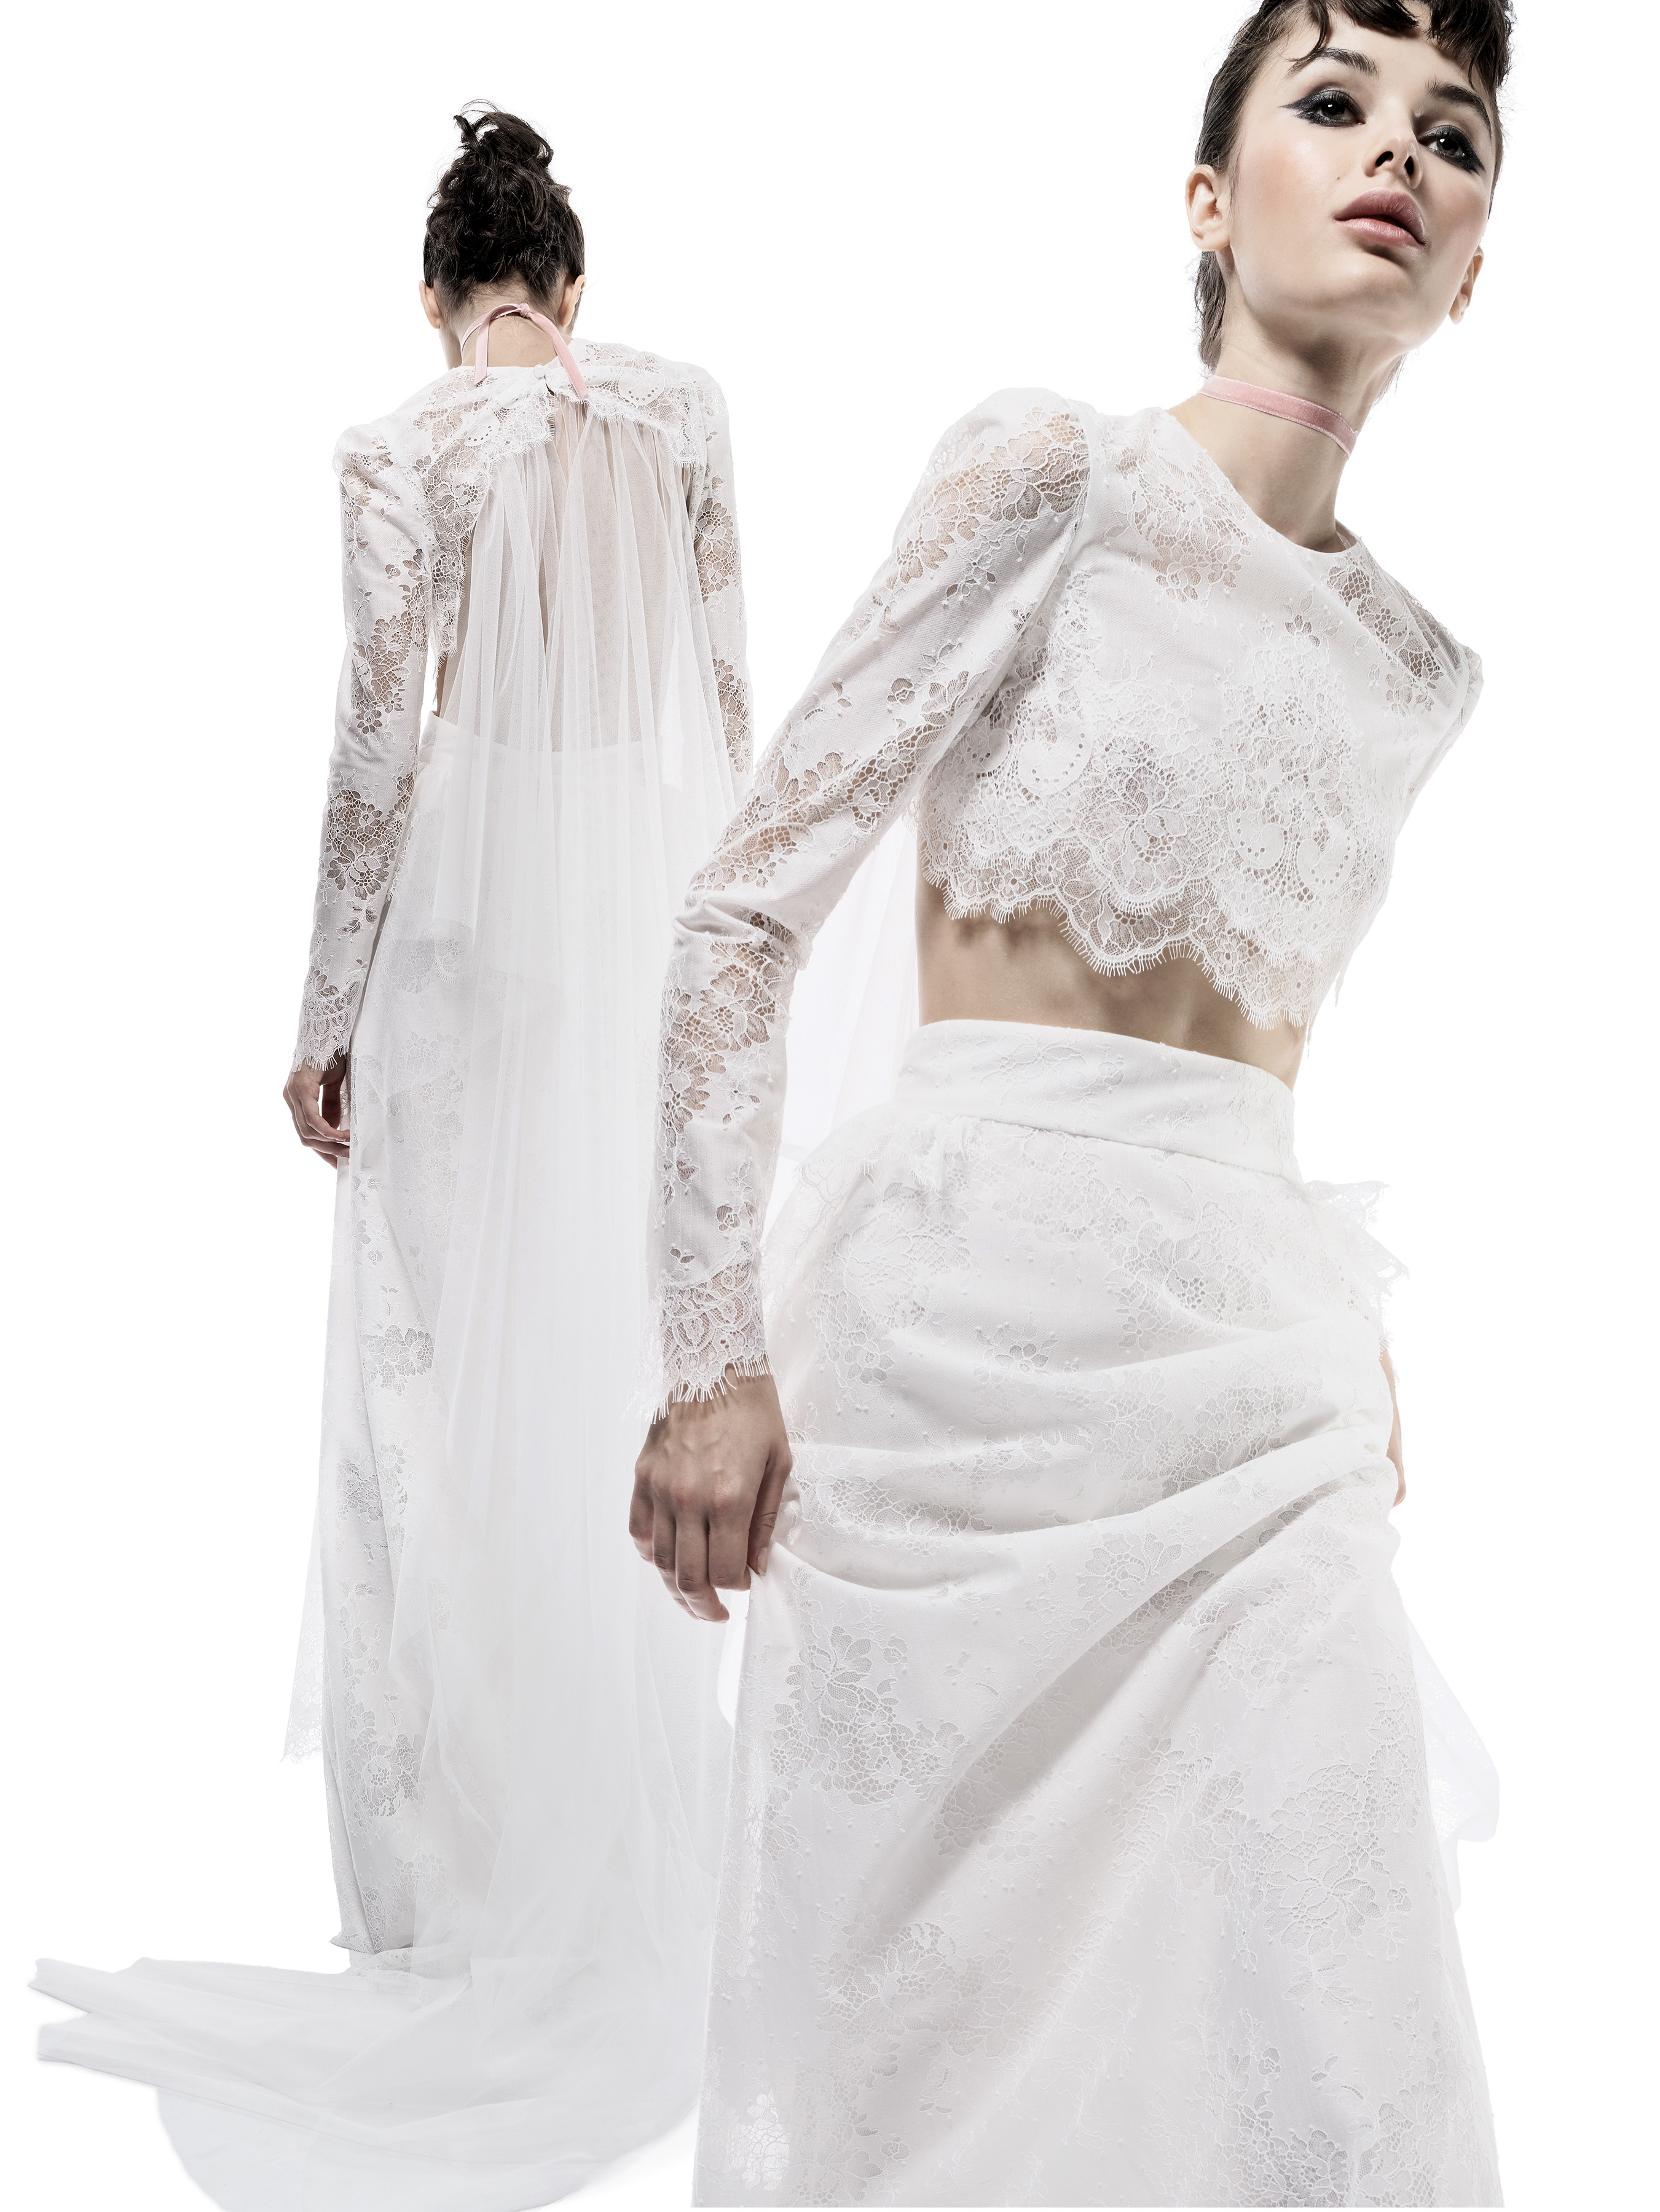 elizabeth fillmore wedding dress fall 2018 two piece lace long sleeves cape